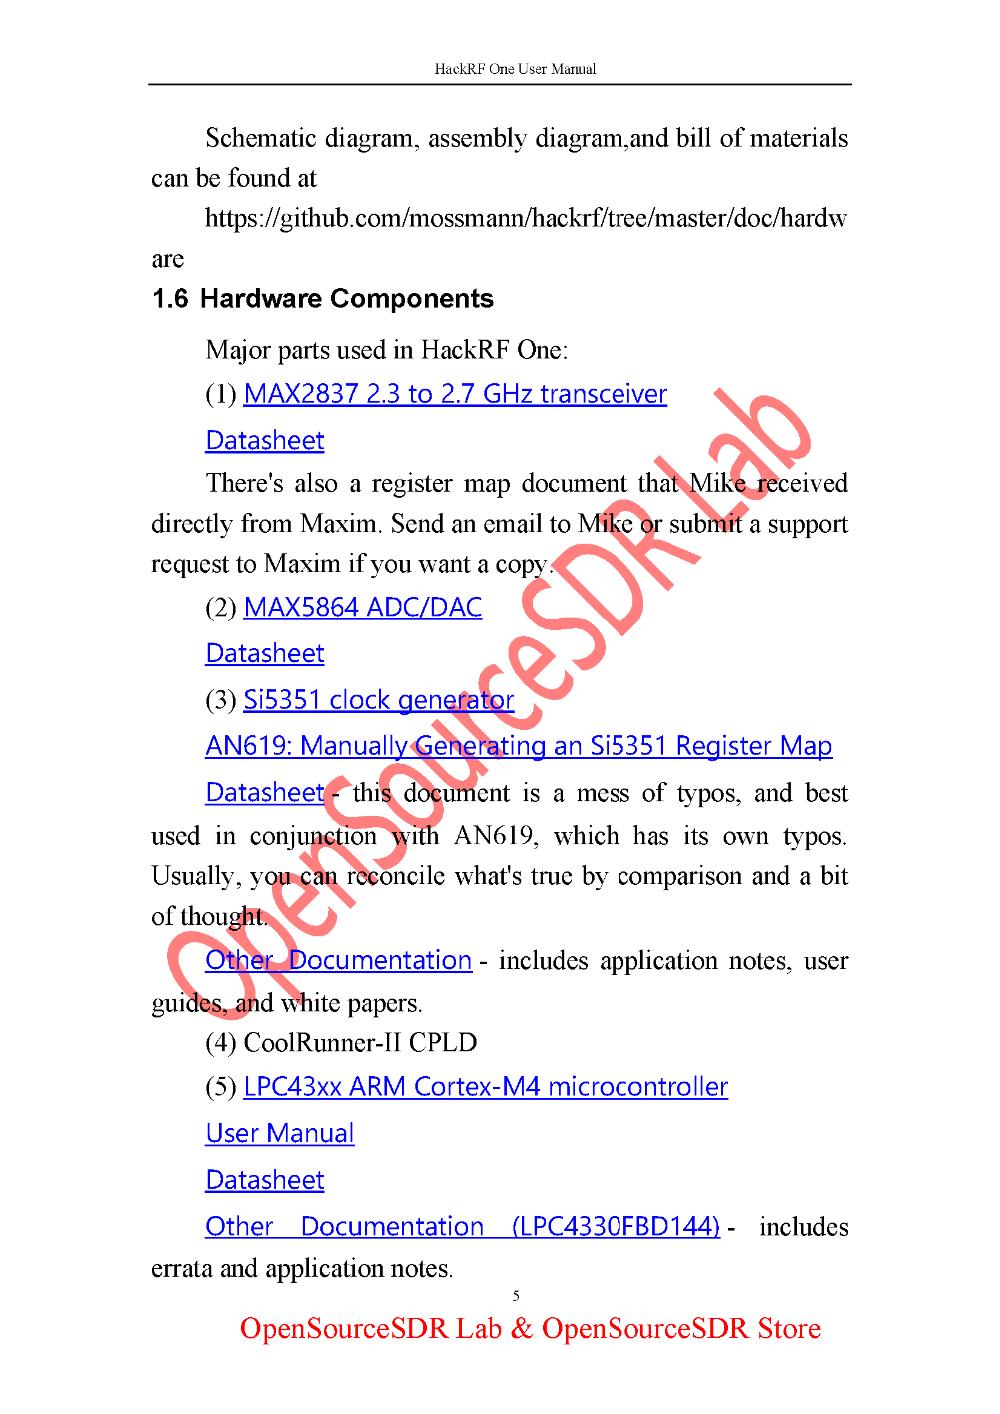 HackRF One User Manual_页面_07